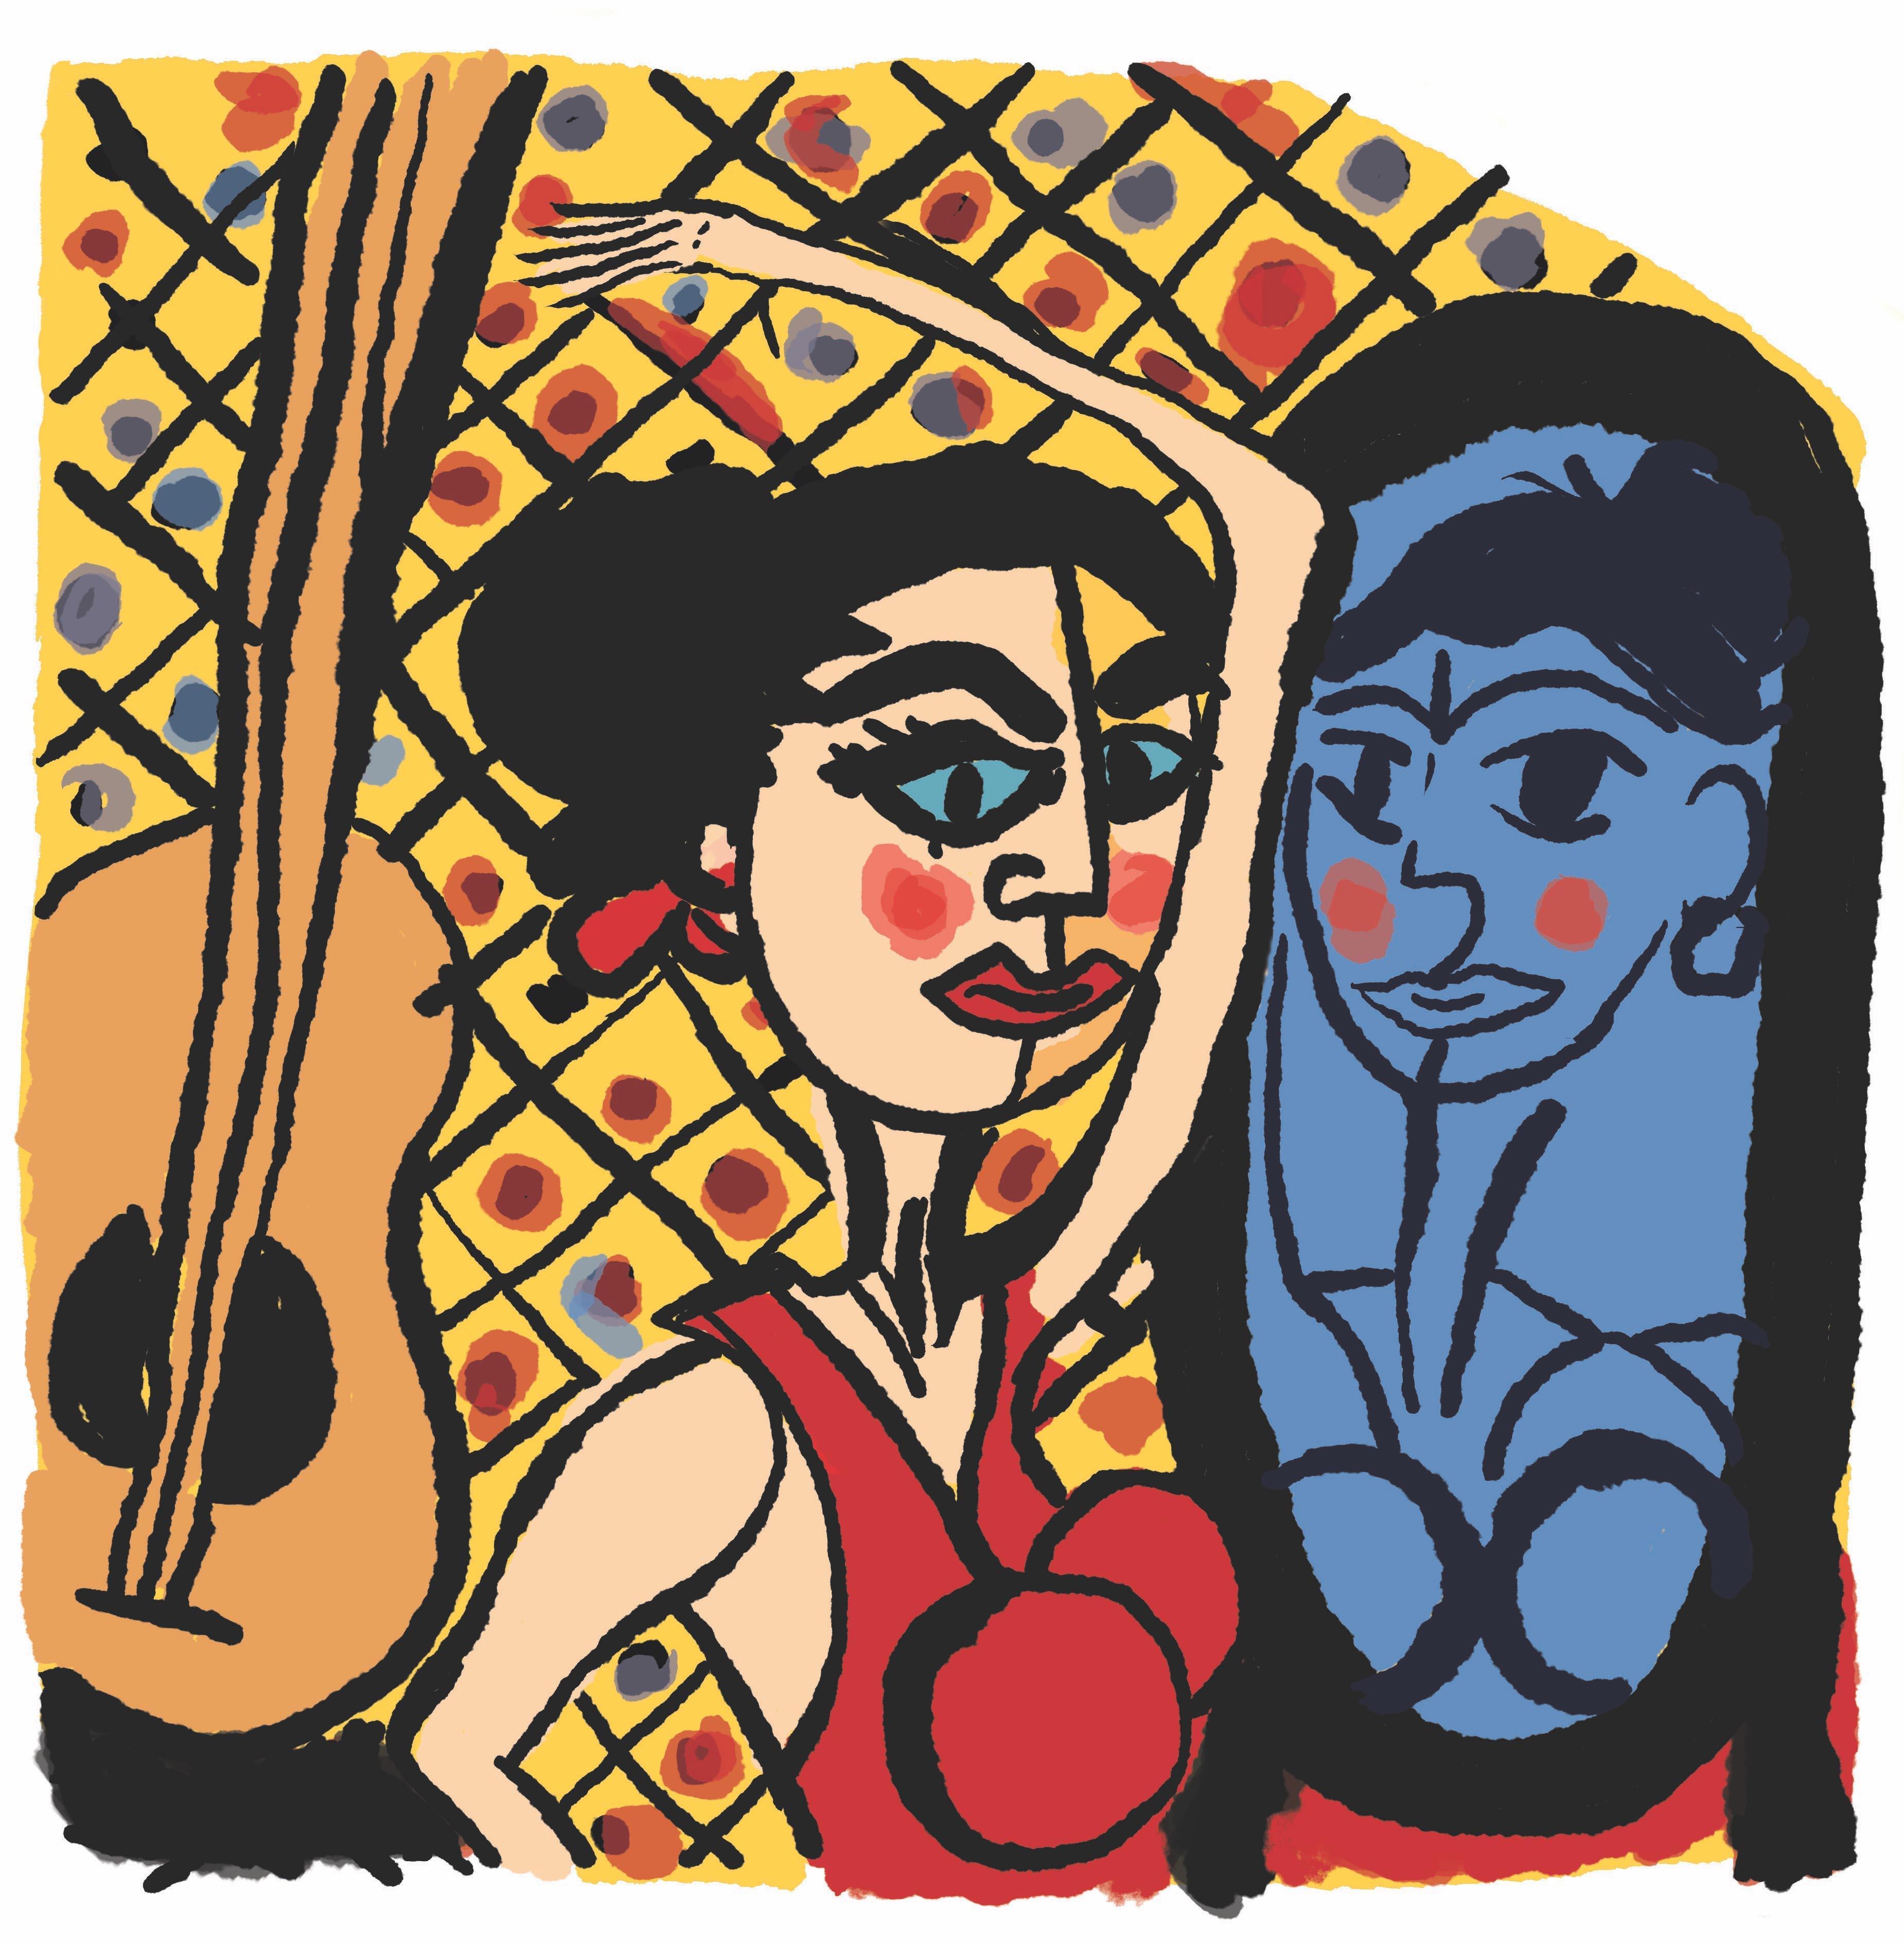 España El Vito - The Spirit of Spain - Piano and Guitar Recital - Canberra